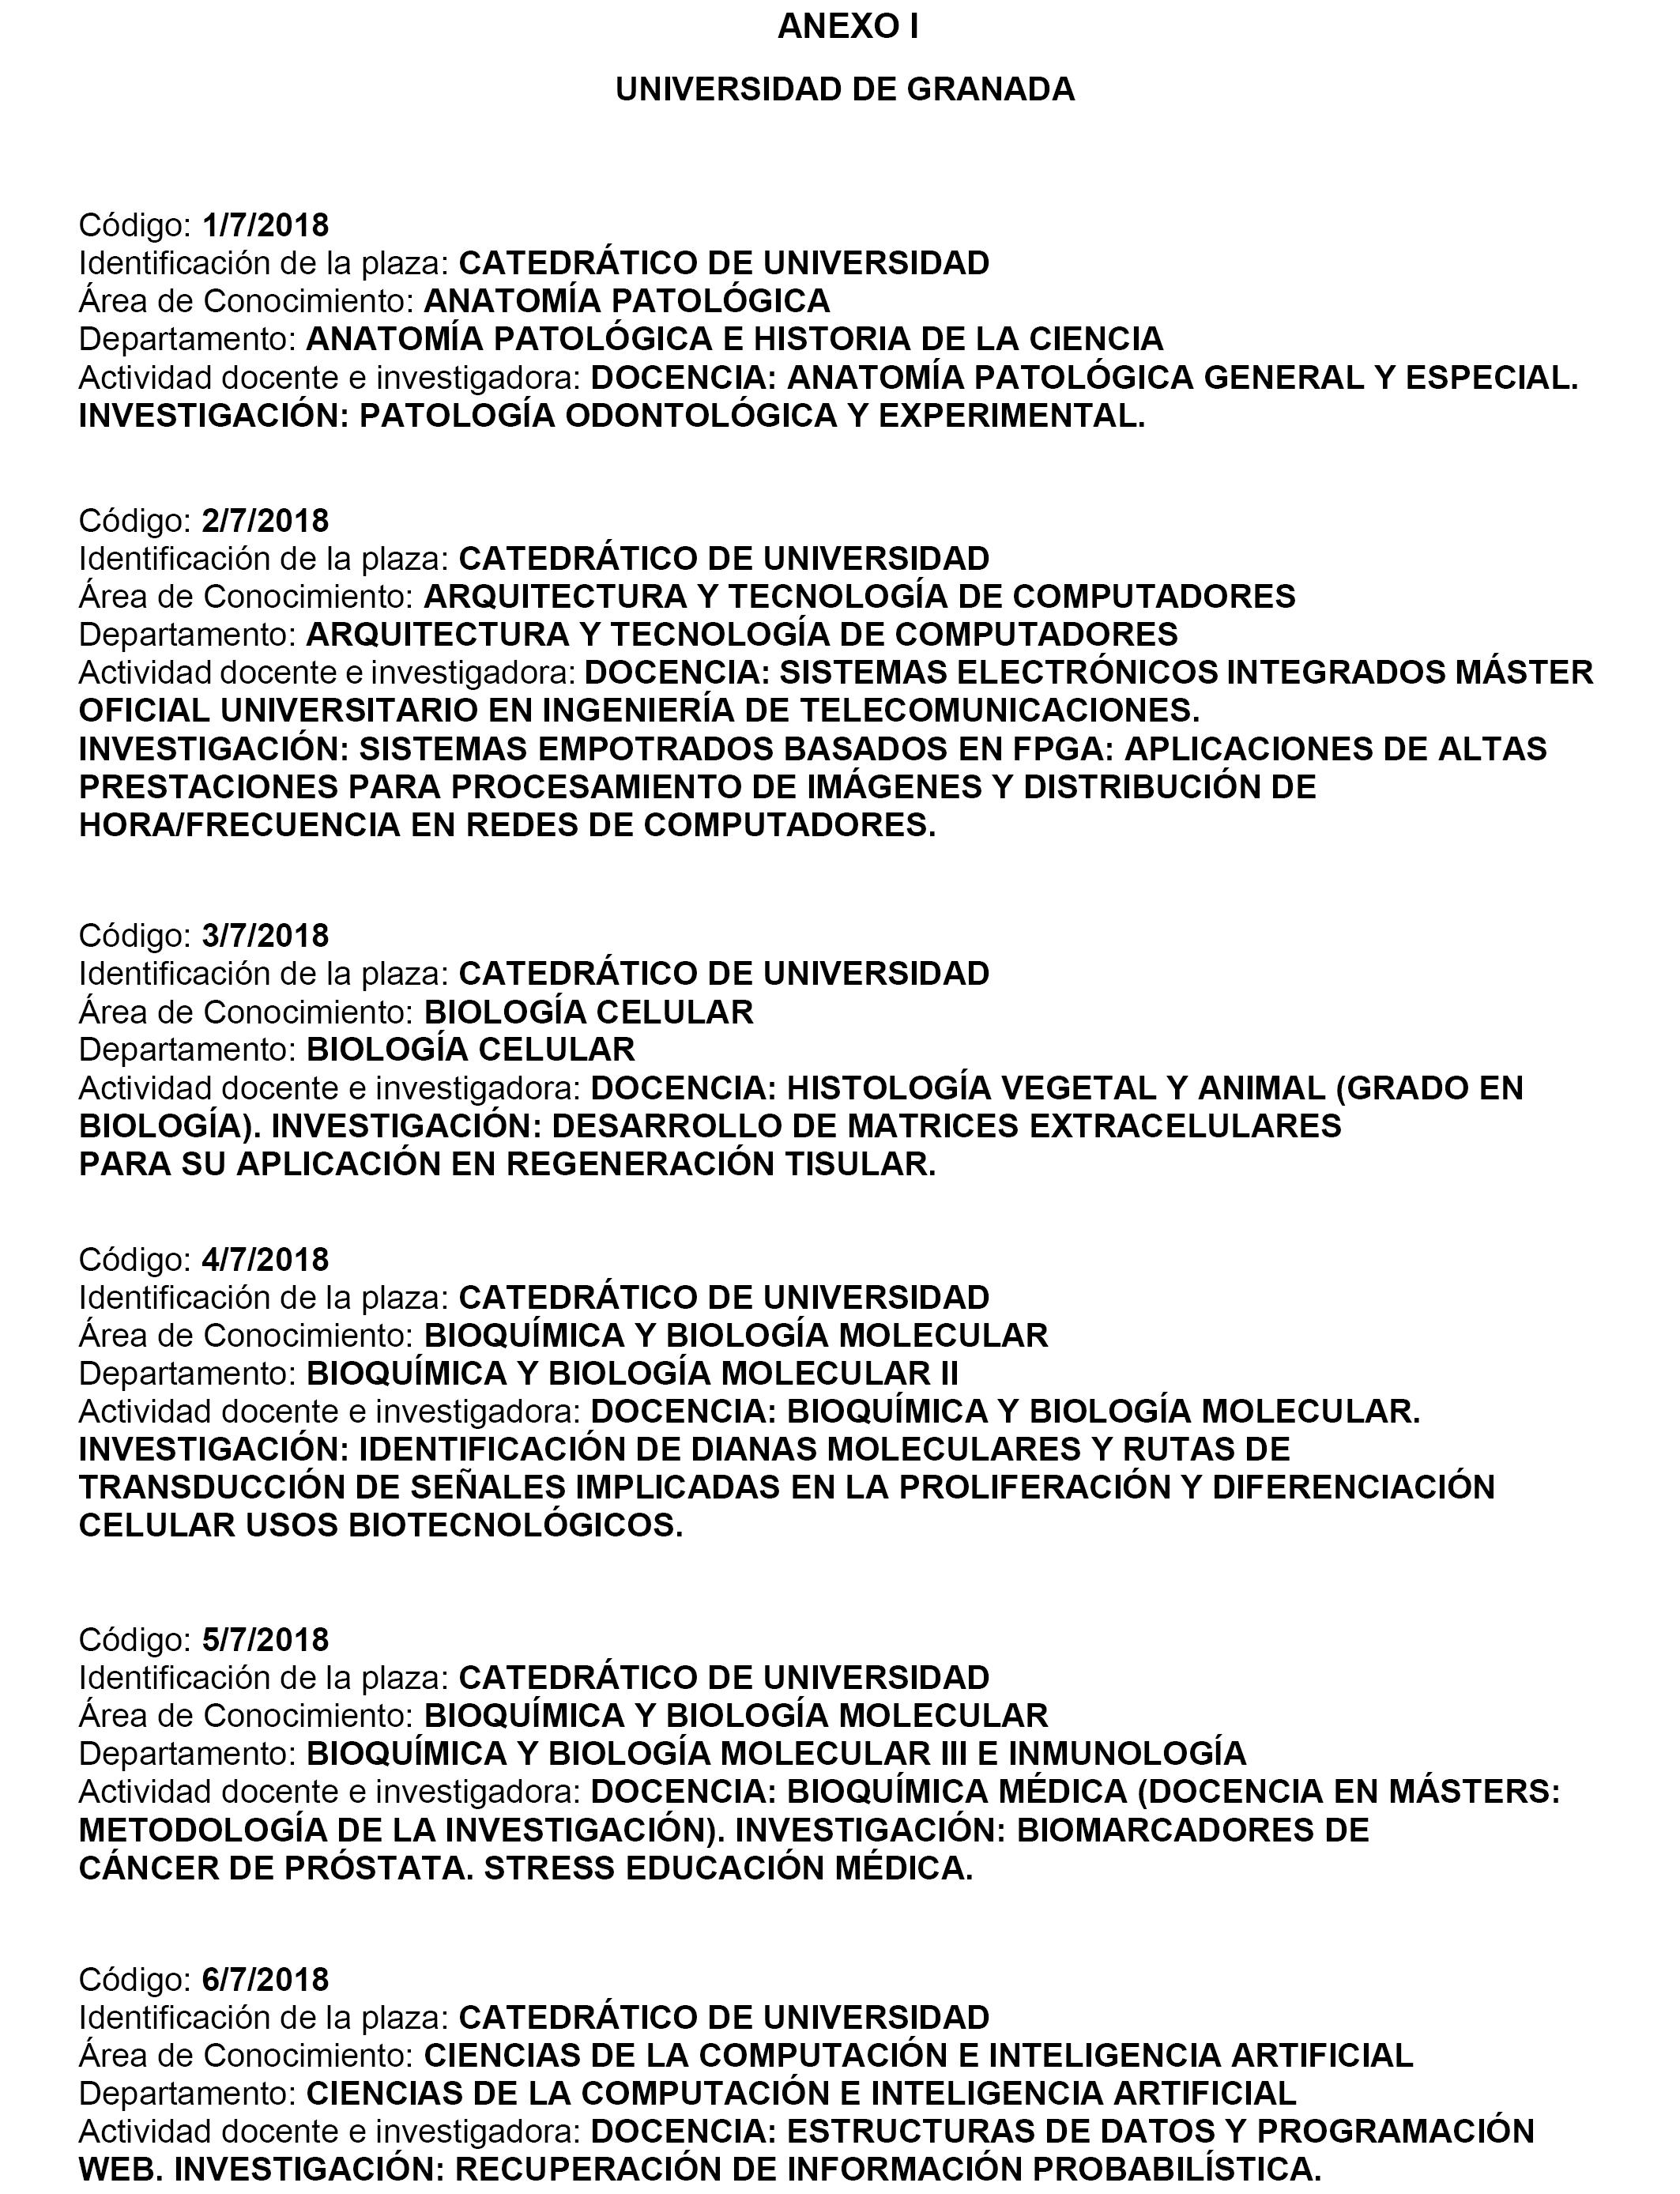 BOE.es - Documento BOE-A-2018-10494